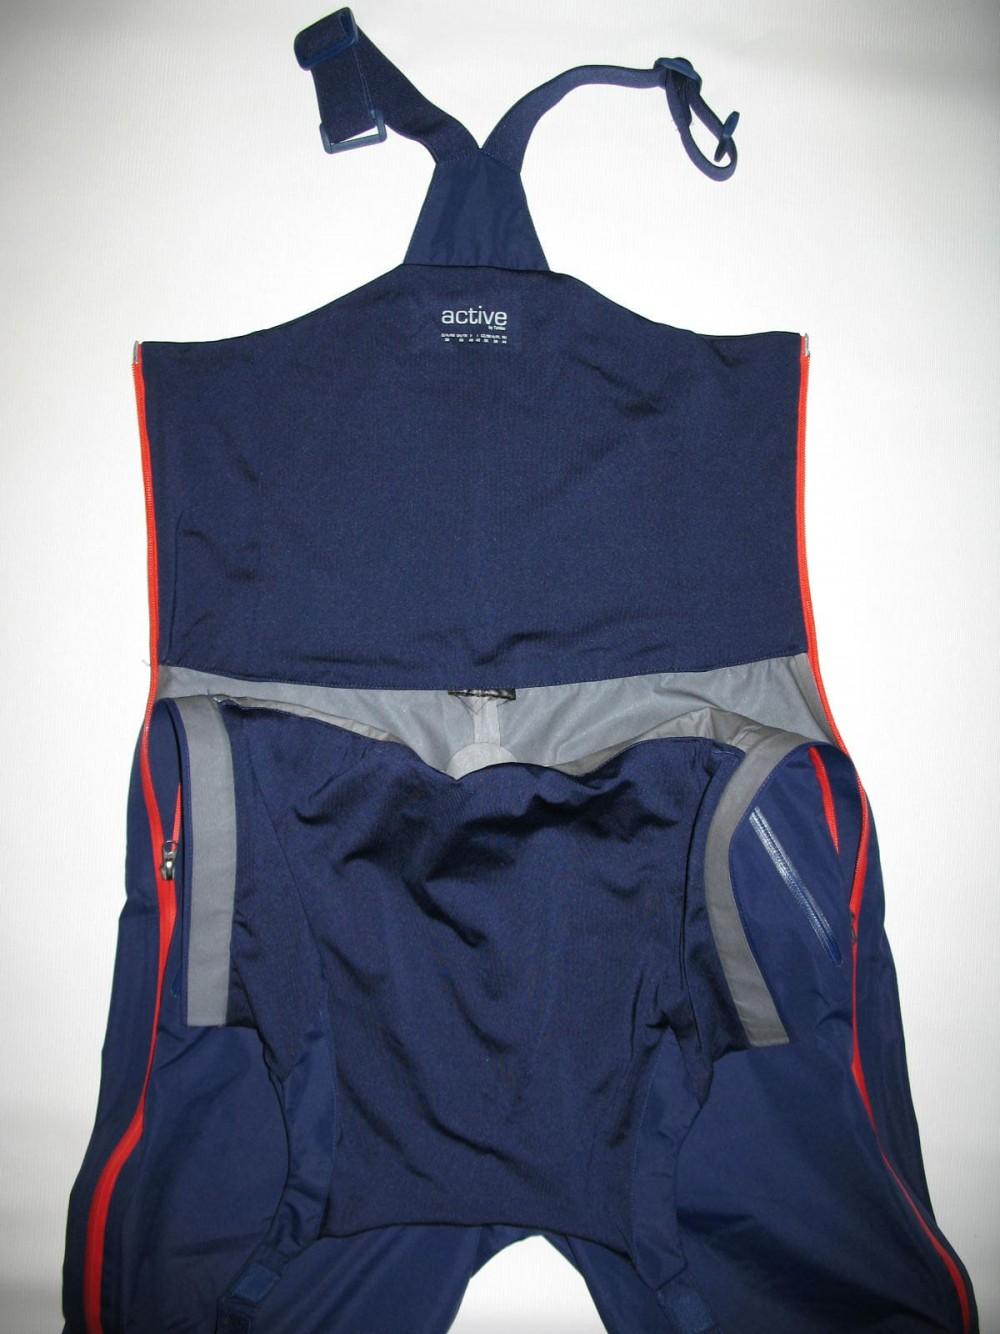 Штаны ACTIVE membrain pants lady (размер 38/M) - 4